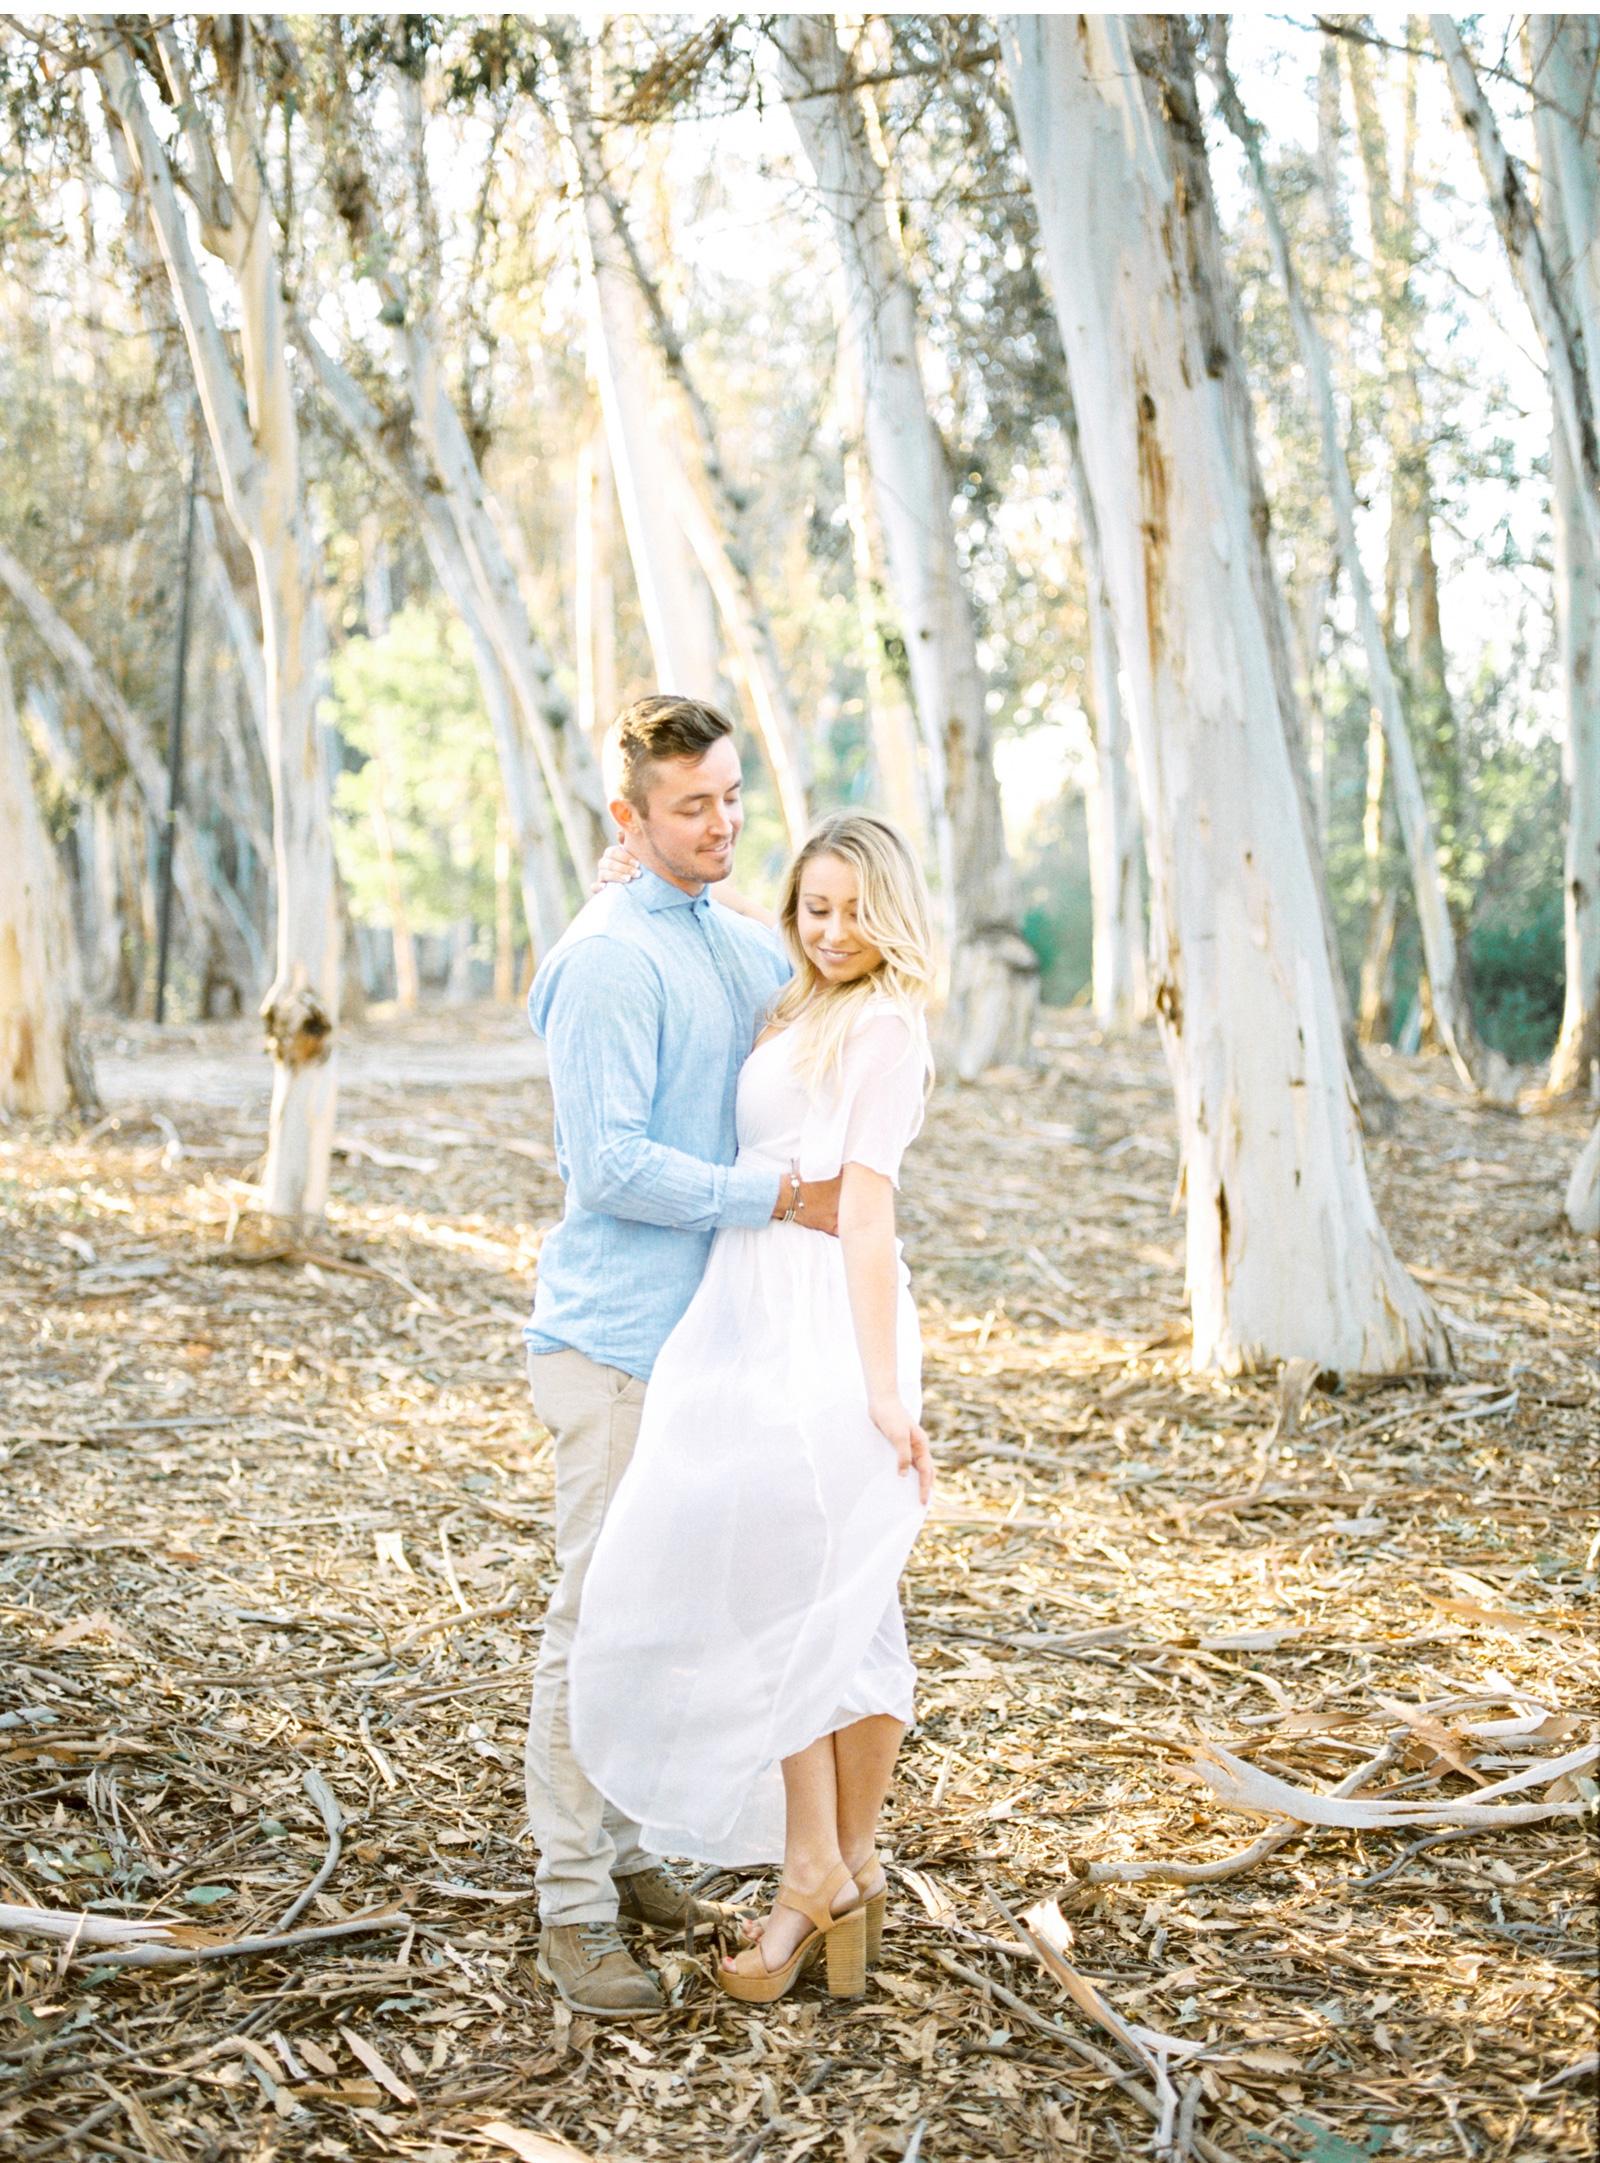 Malibu-Wedding-Natalie-Schutt-Photography-Style-Me-Pretty_03.jpg